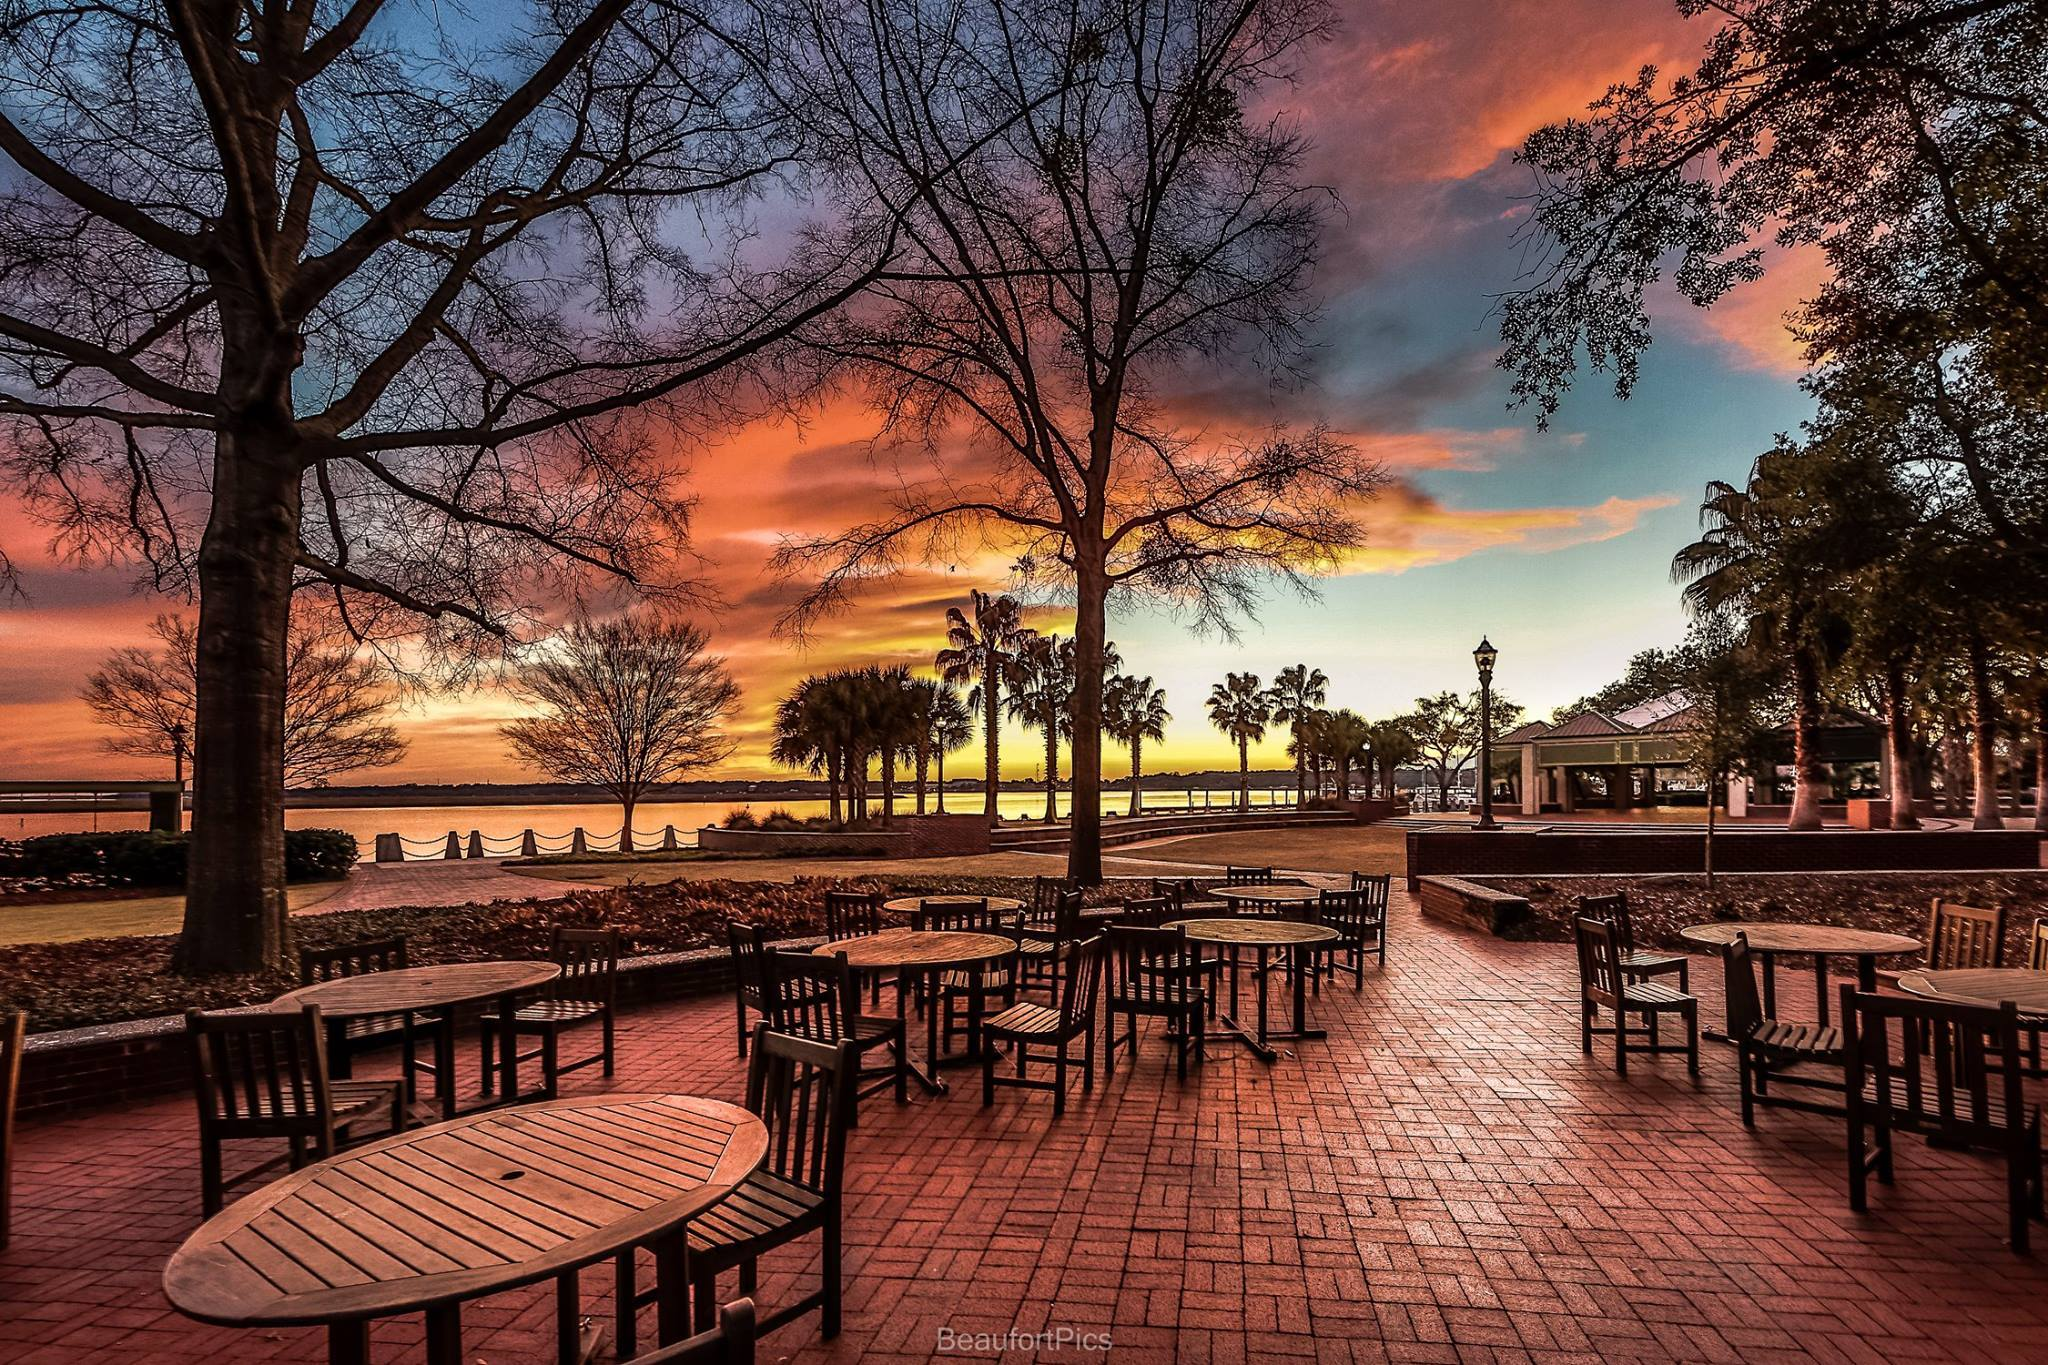 Bing Fall Desktop Wallpaper Beaufort Waterfront At Sunset